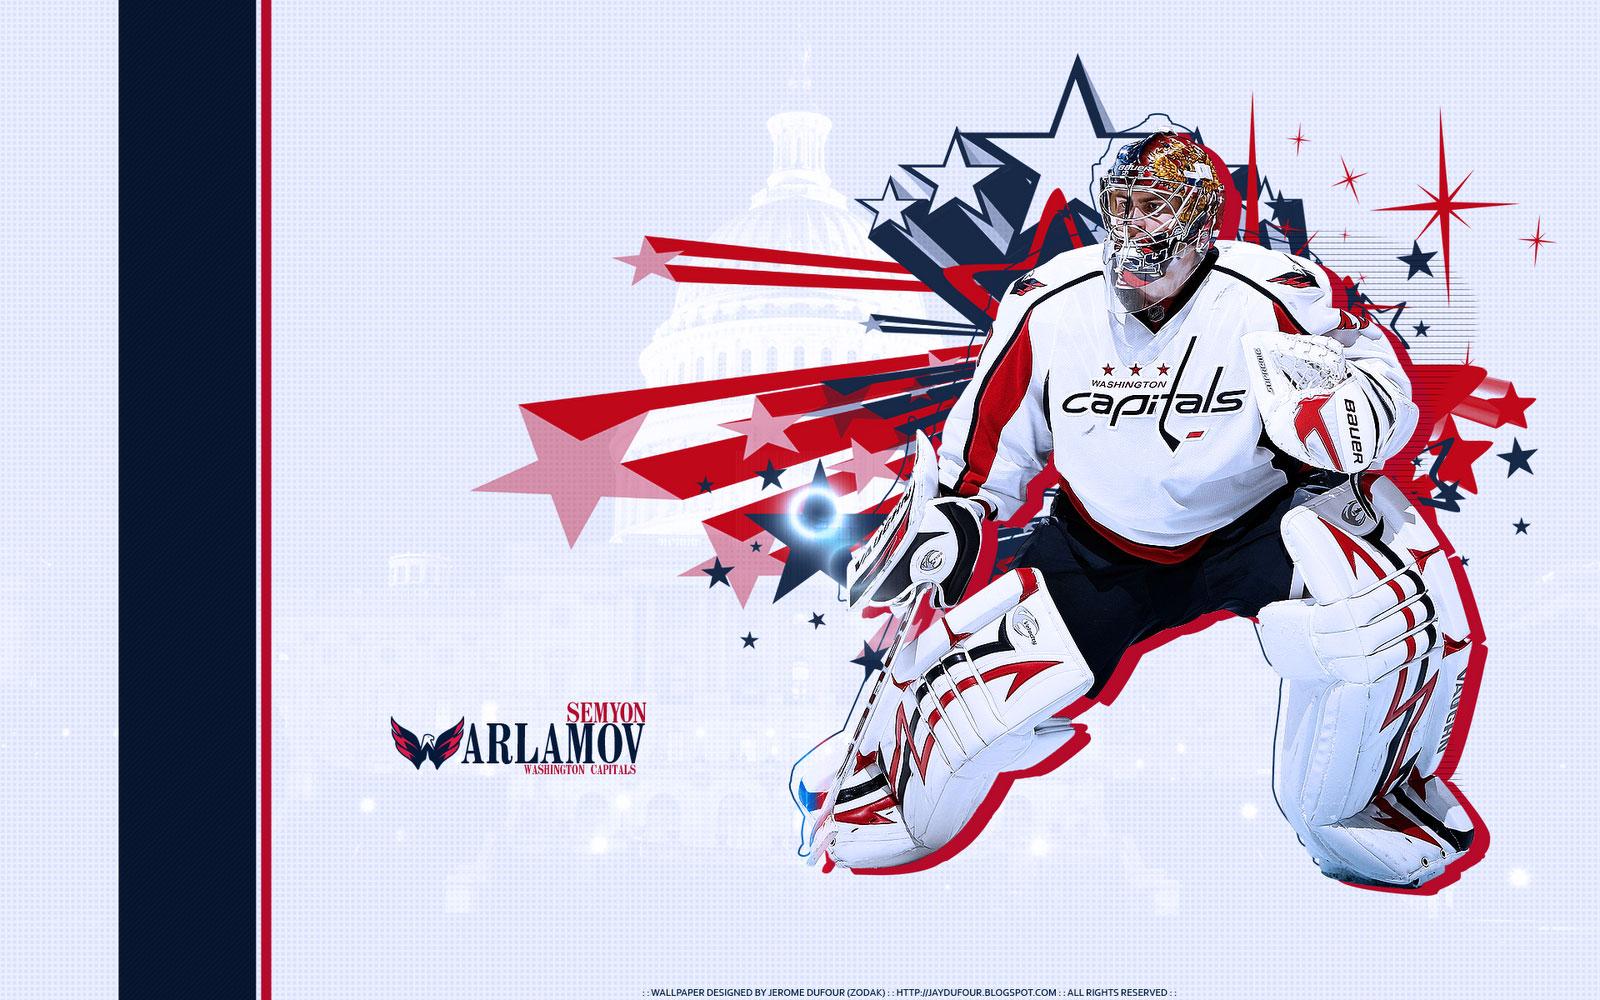 Download Wallpapers Semyon Varlamov Washington Capitals Widescreen 1600x1000